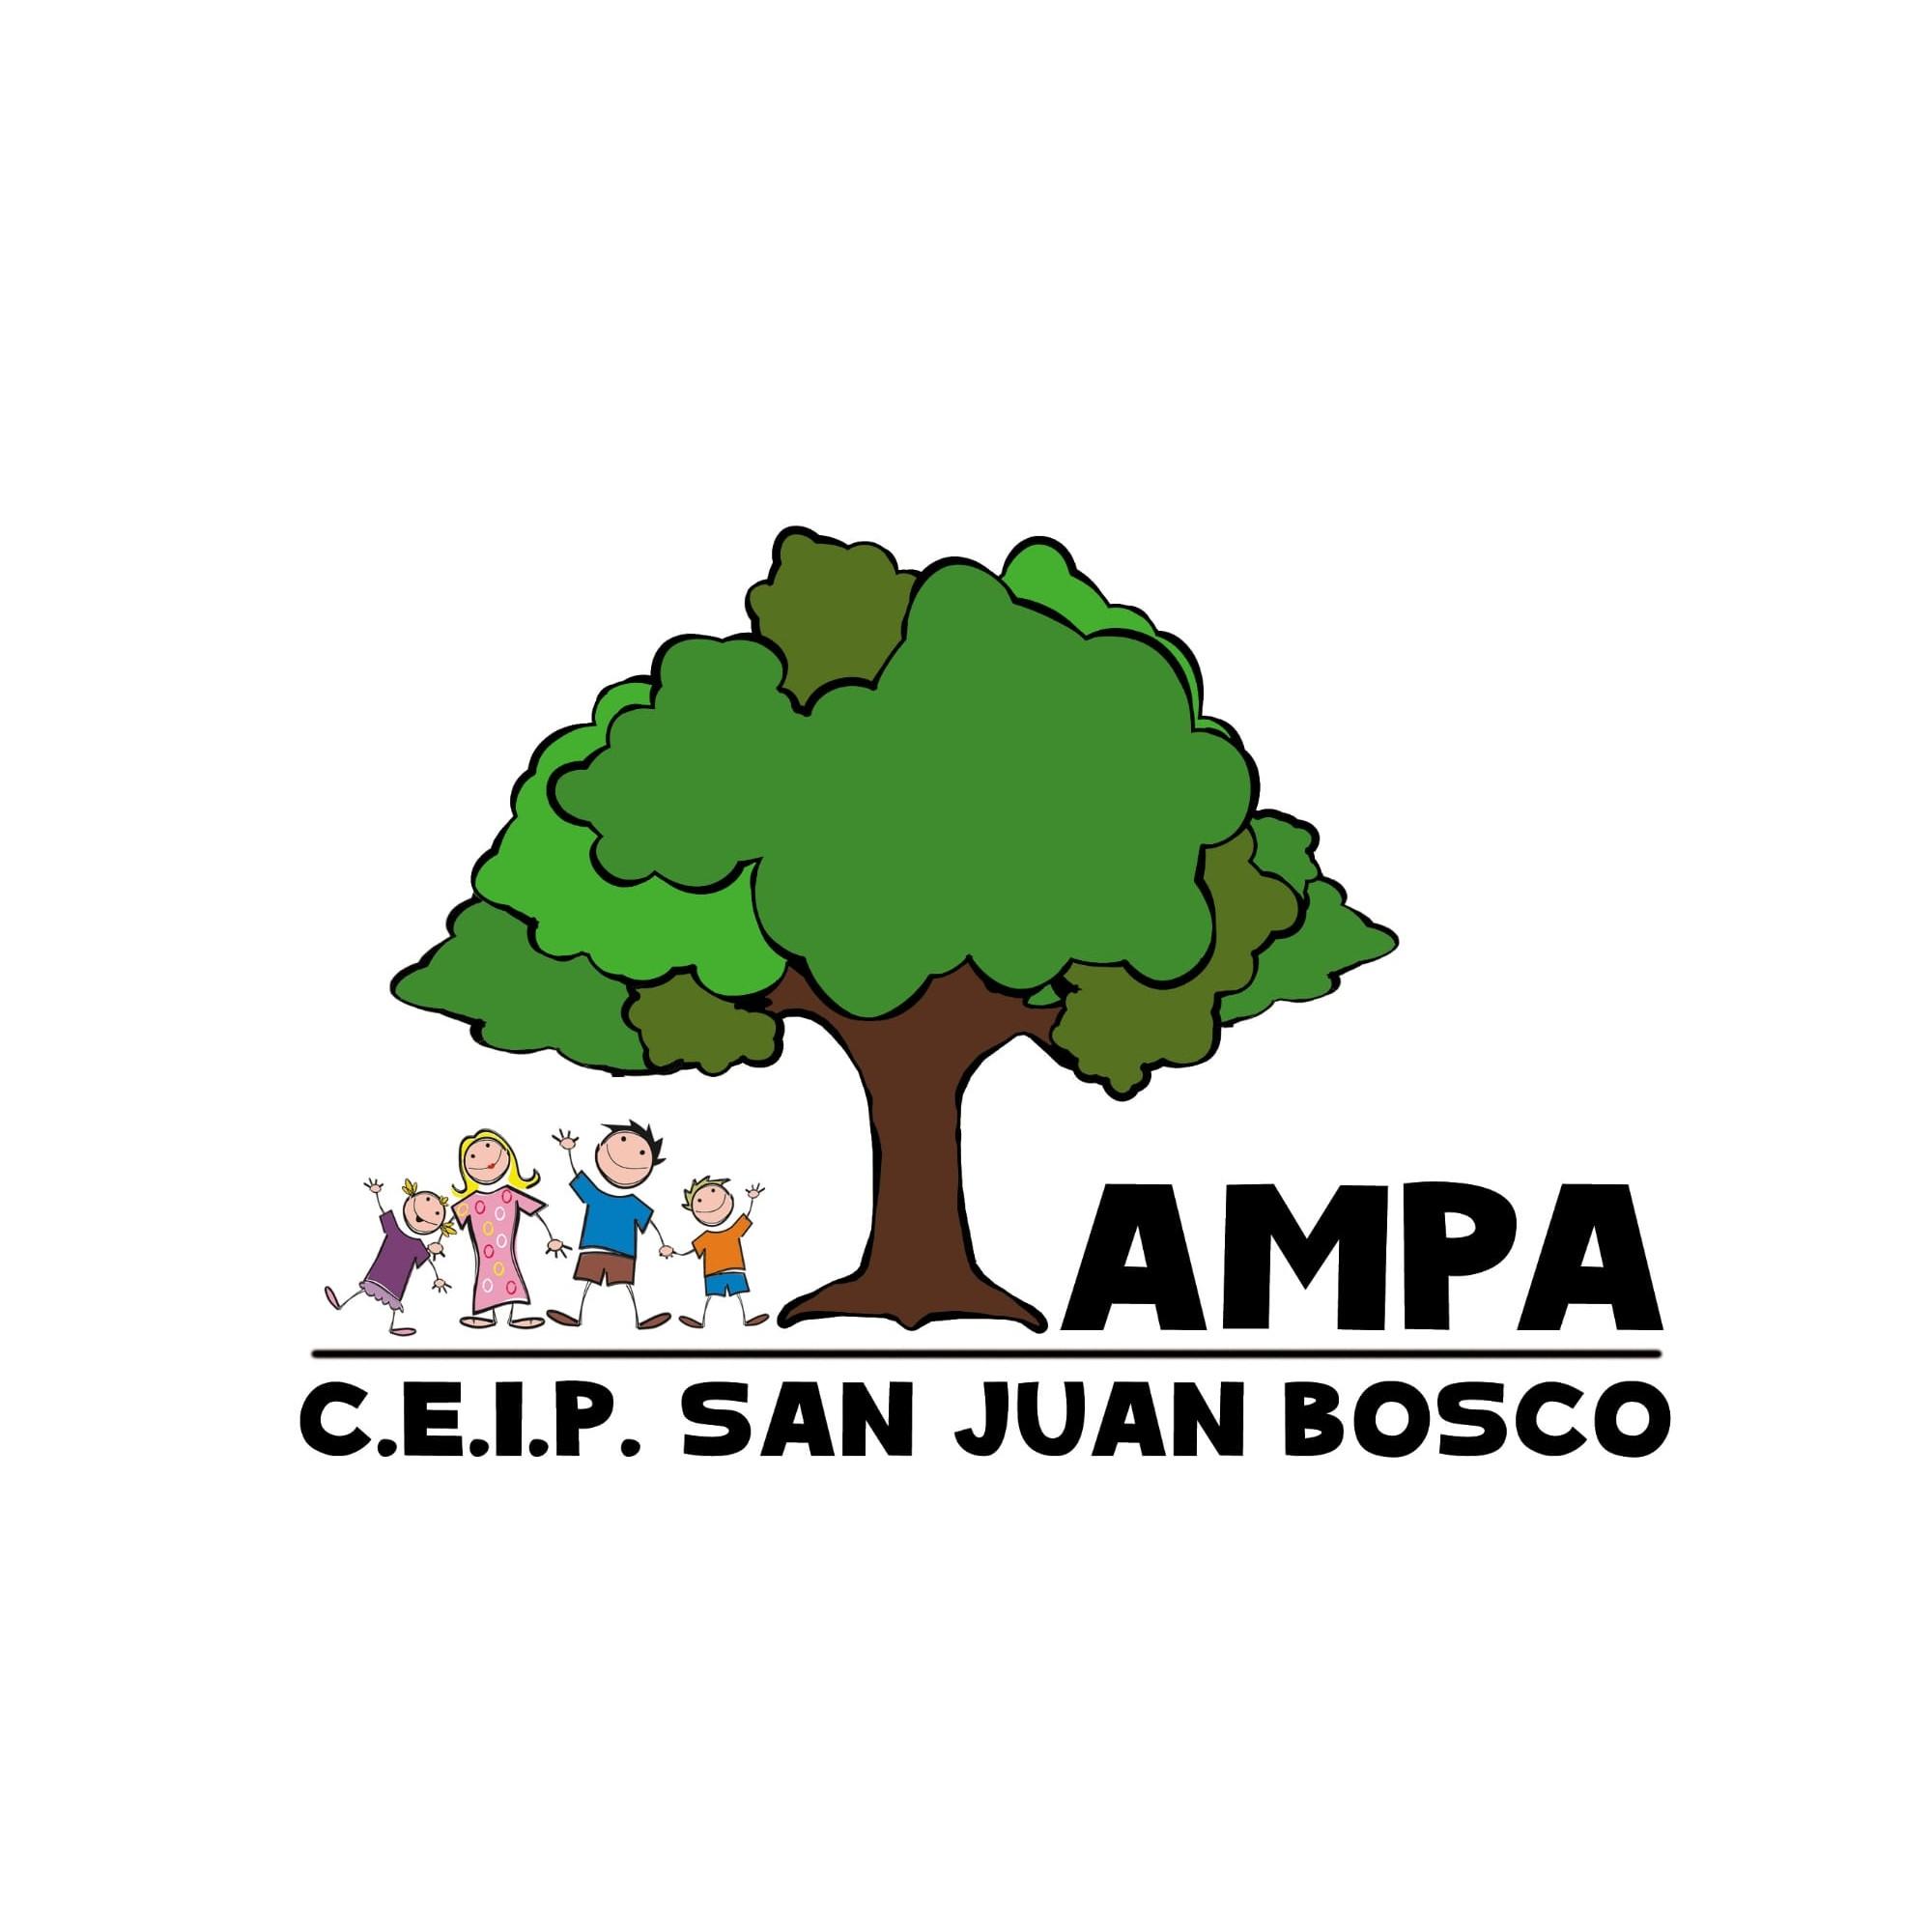 A.M.P.A. San Juan Bosco